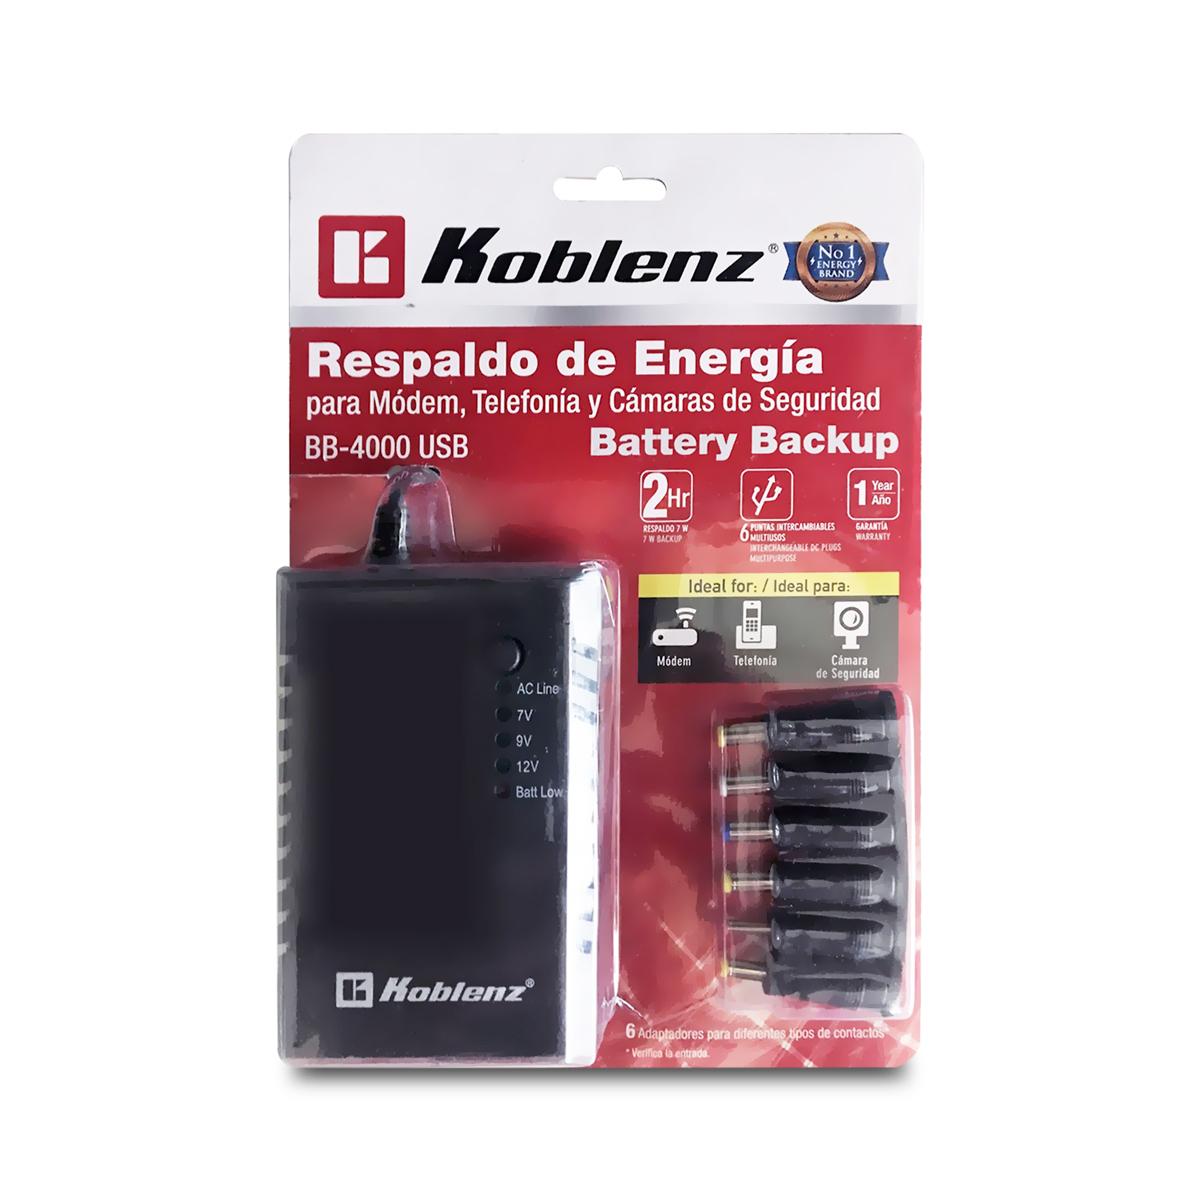 radioshack: NO BREAK KOBLENZ BB-4000 USB hasta 2 horas ROUTER